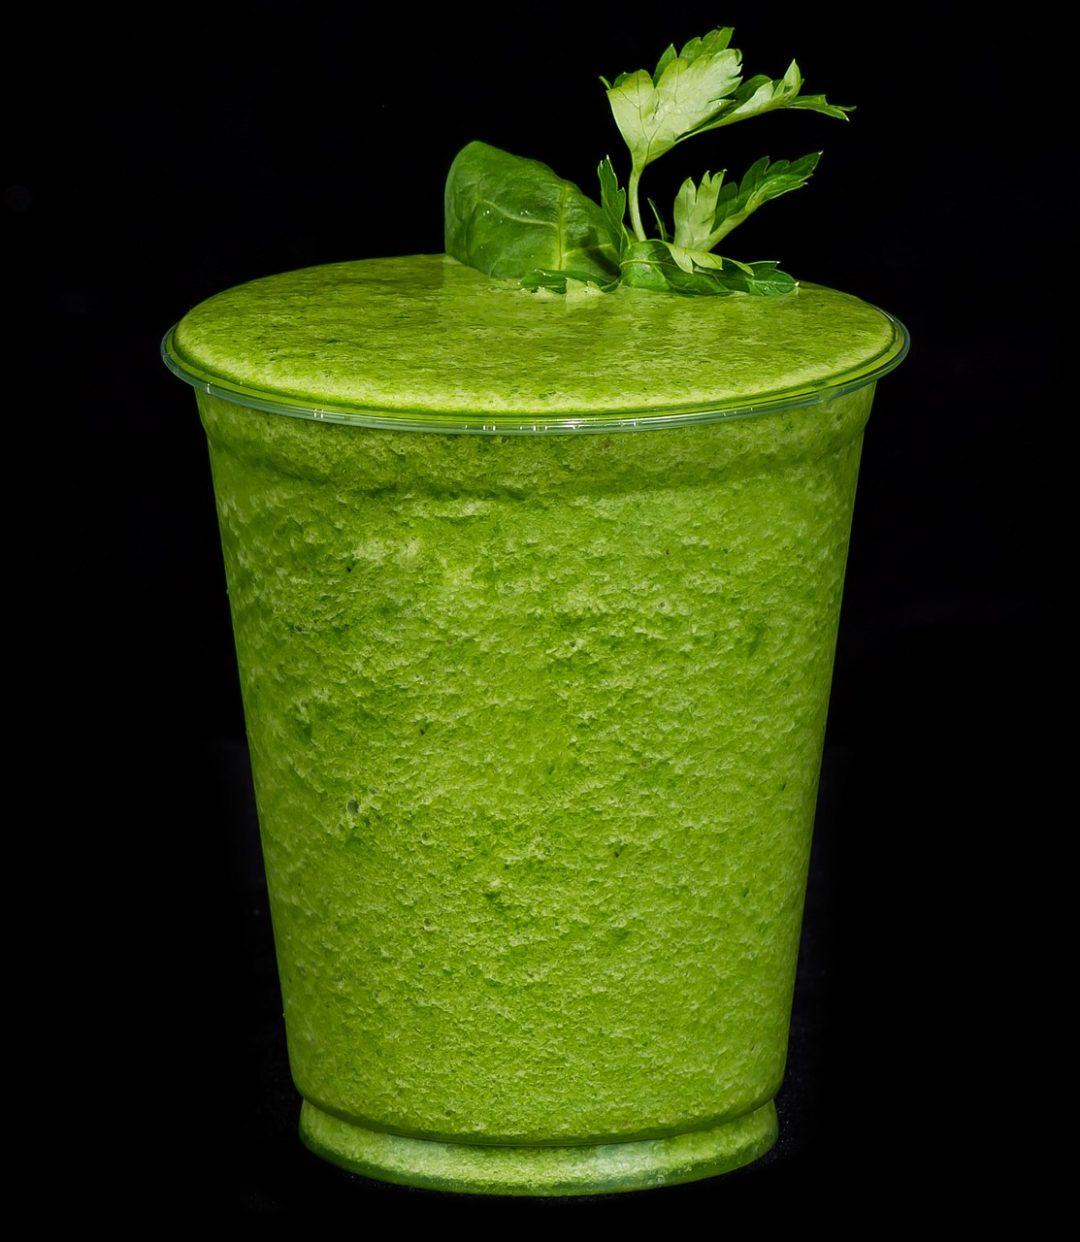 VIDEORECETA FIT/ Mi zumo verde preferido